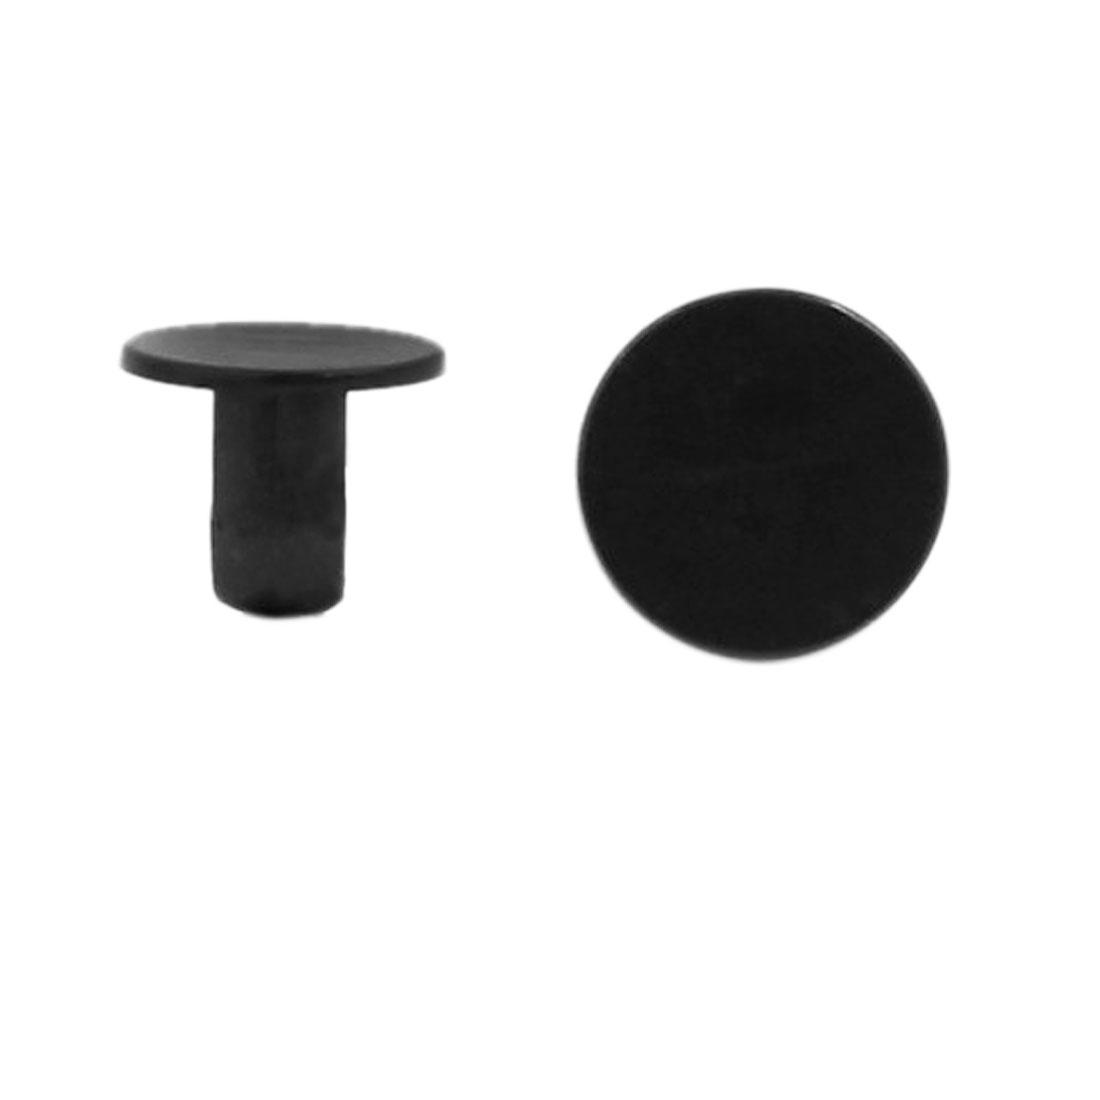 Black Bumper Door Trim Rivet Moulding Panel Clips Retainer Fastener 100 Pcs